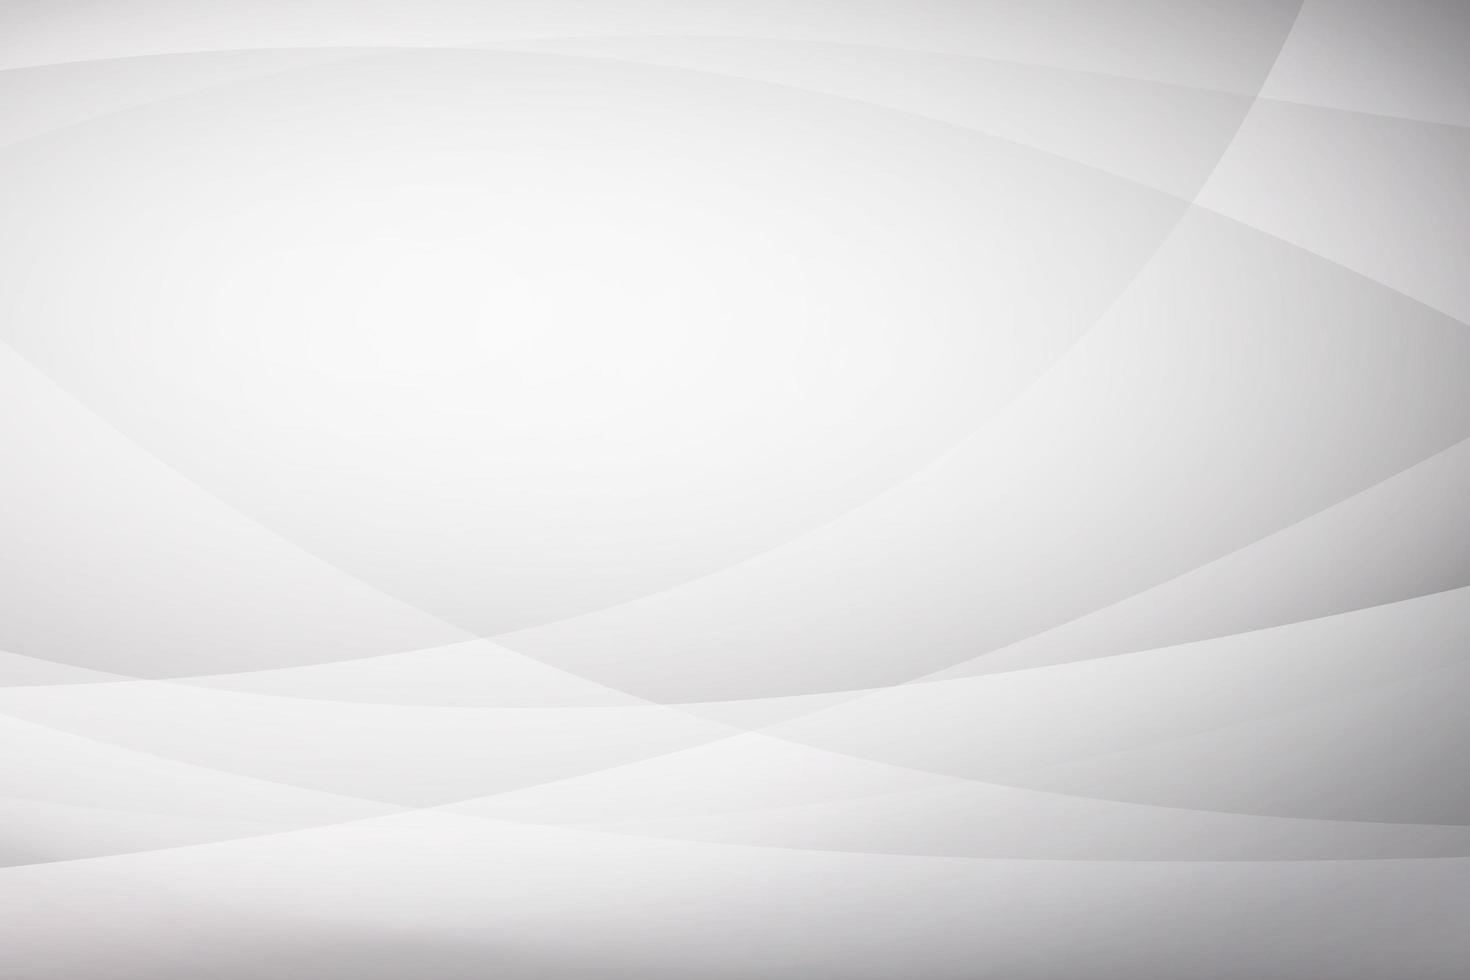 abstrakt vit kurvbakgrund vektor